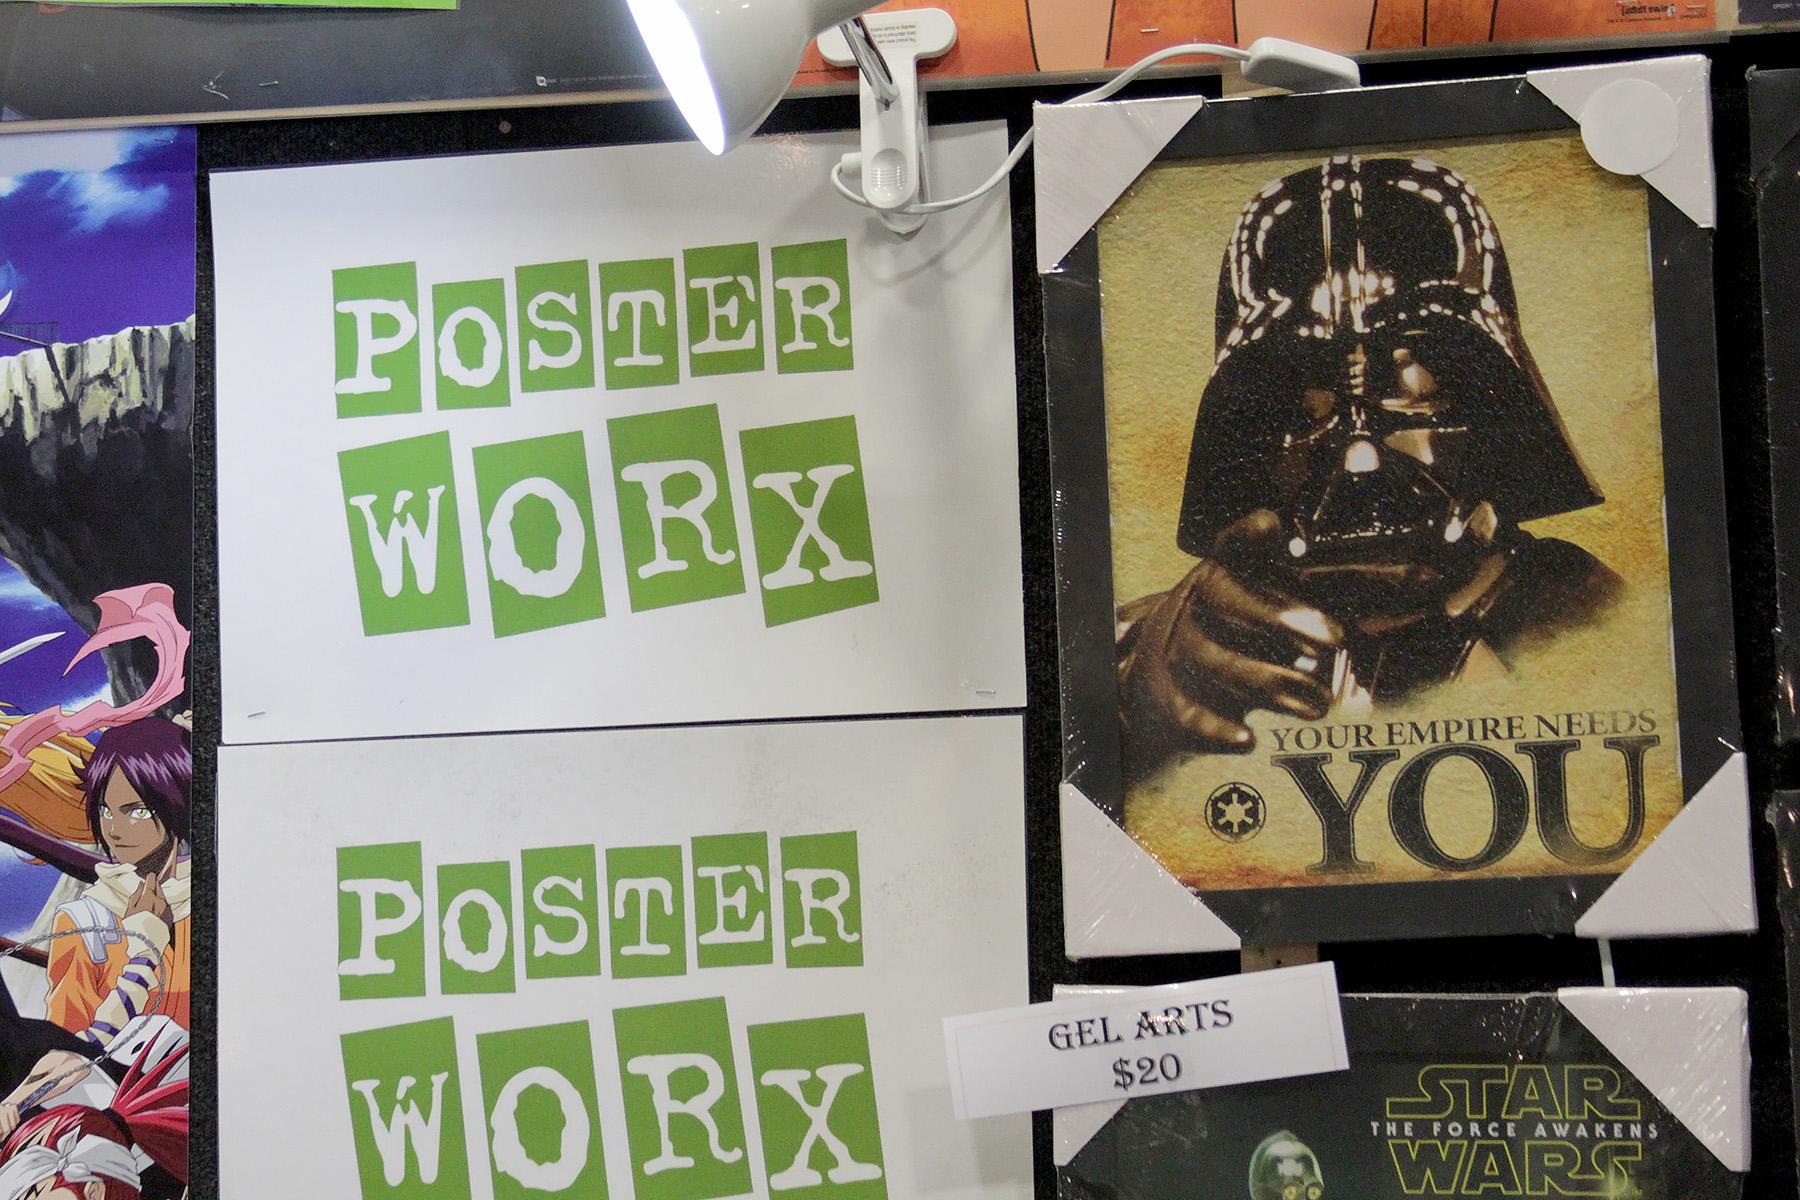 Poster Worx